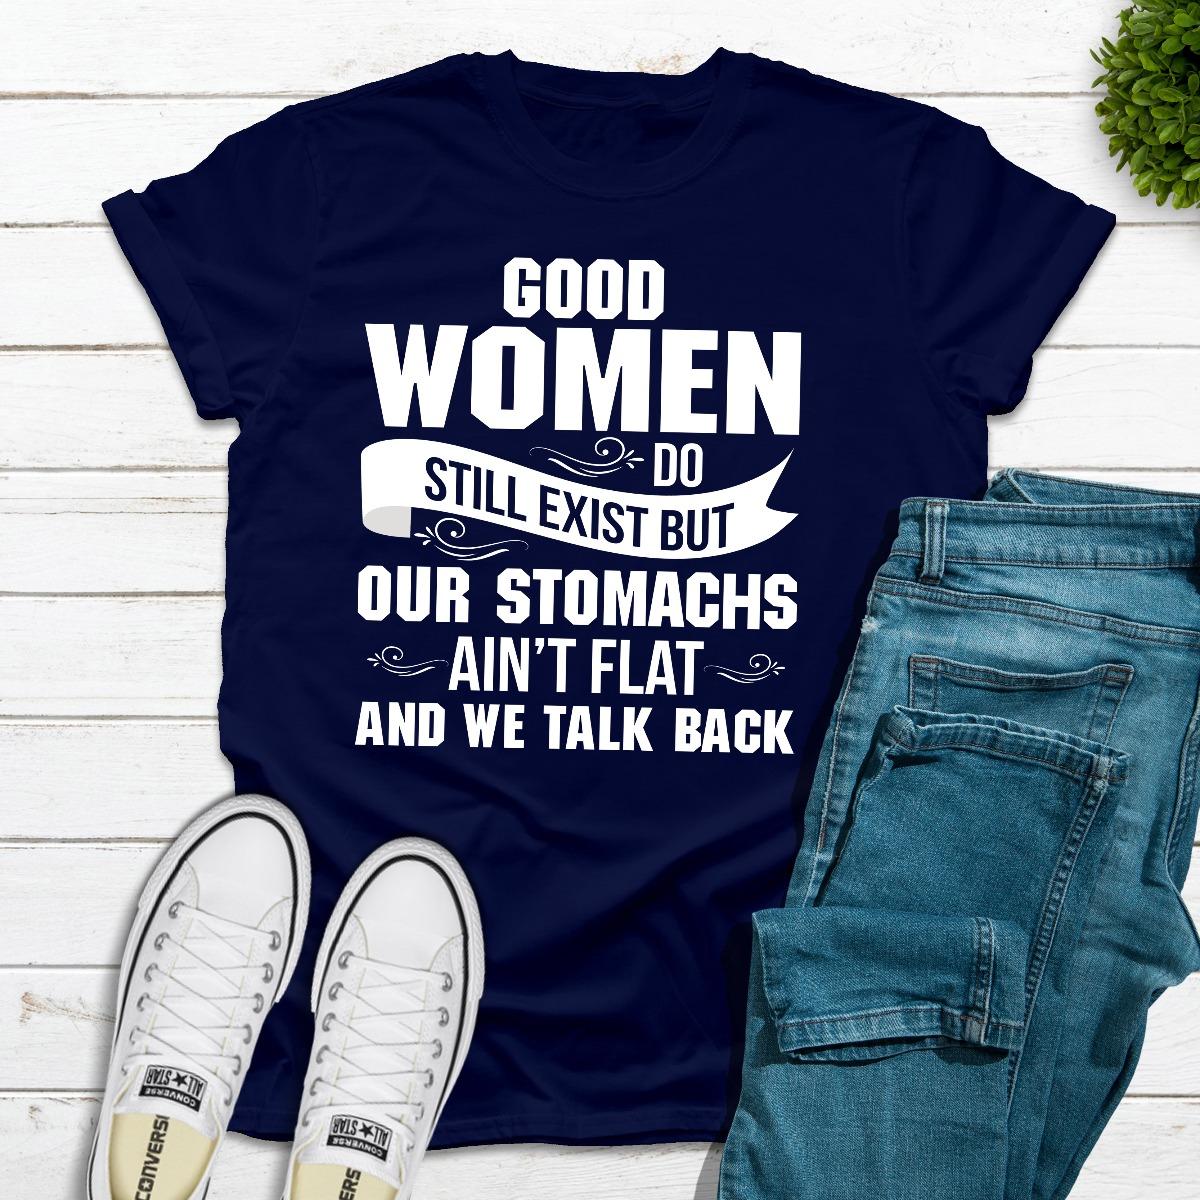 Good Women Do Still Exist (Navy / M)